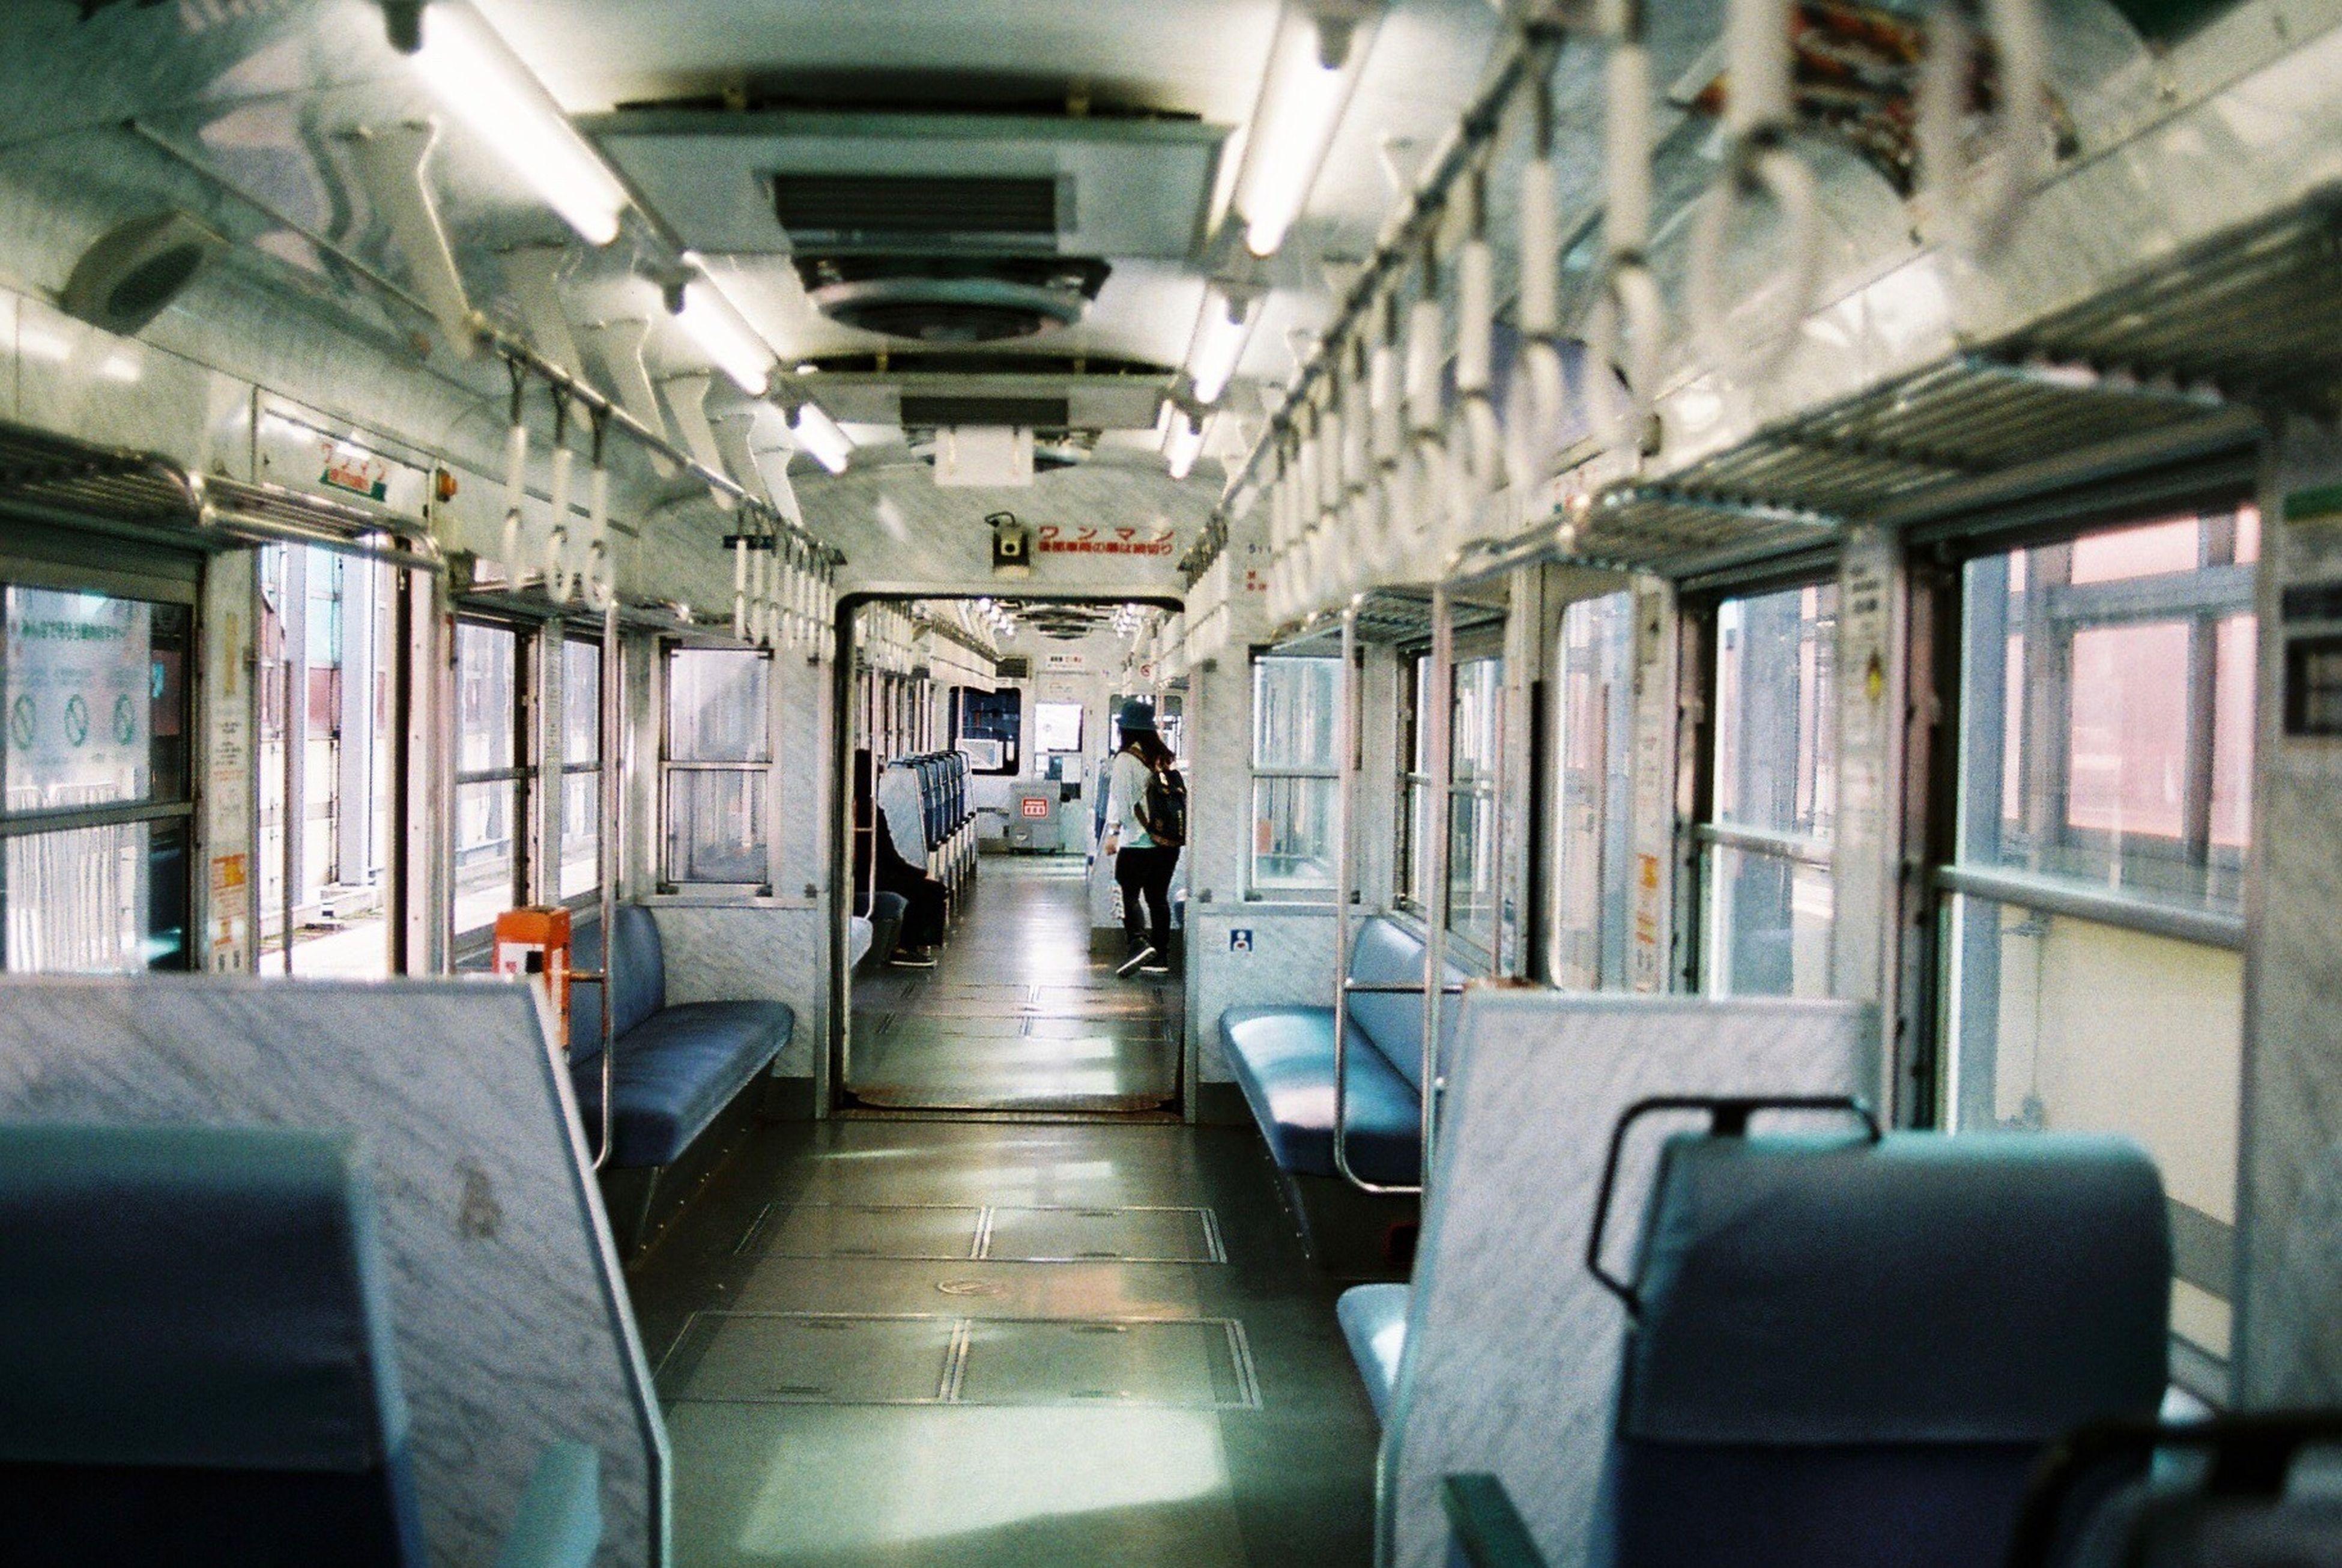 indoors, transportation, travel, public transportation, subway train, train interior, no people, day